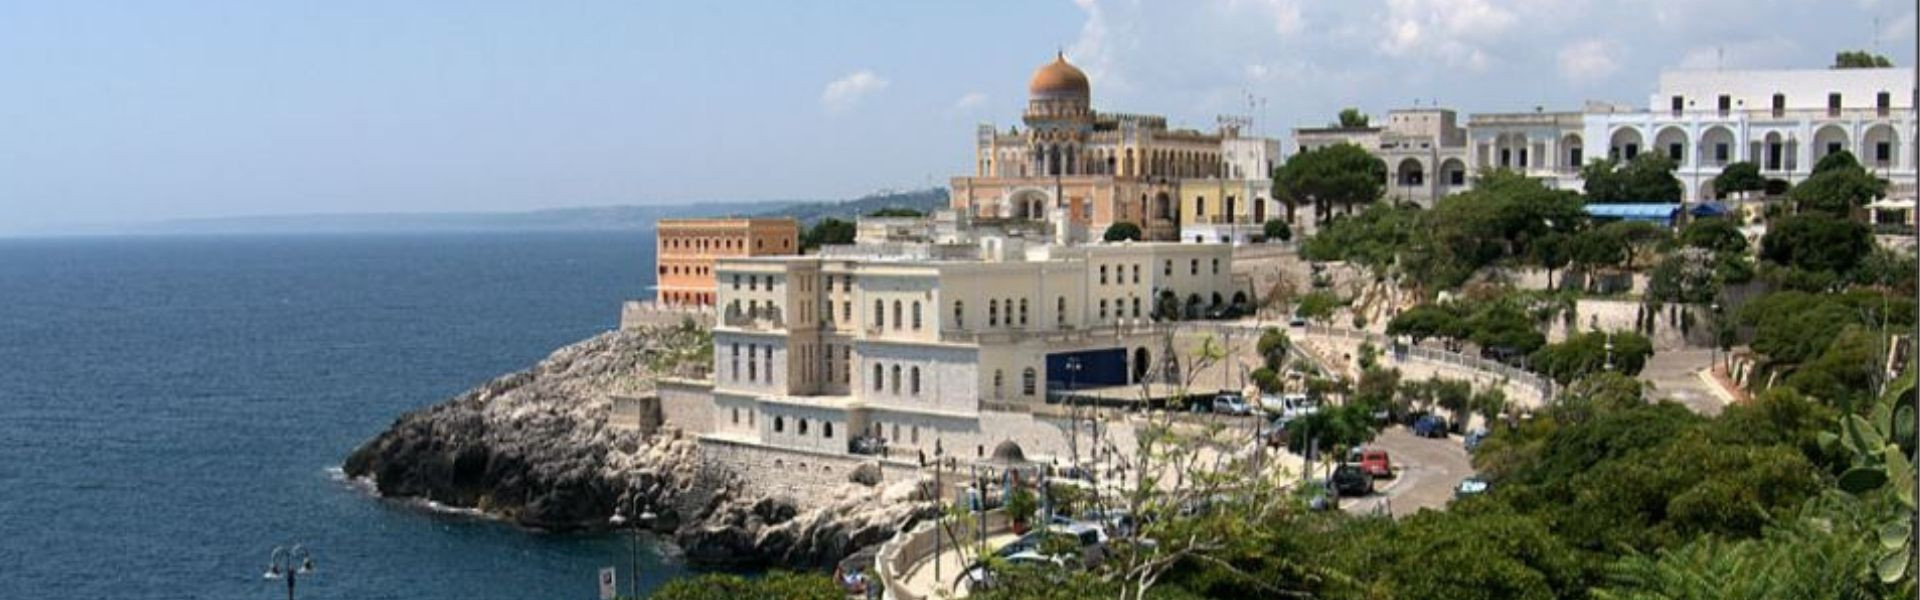 Main image ofItalie Bari (Puglia) région des Pouilles 6 étapes en 7 jours (2 pers) Bari, Lecce, Ostuni, Brindisi, Tarente, Matera, Alberobello, Monopoli